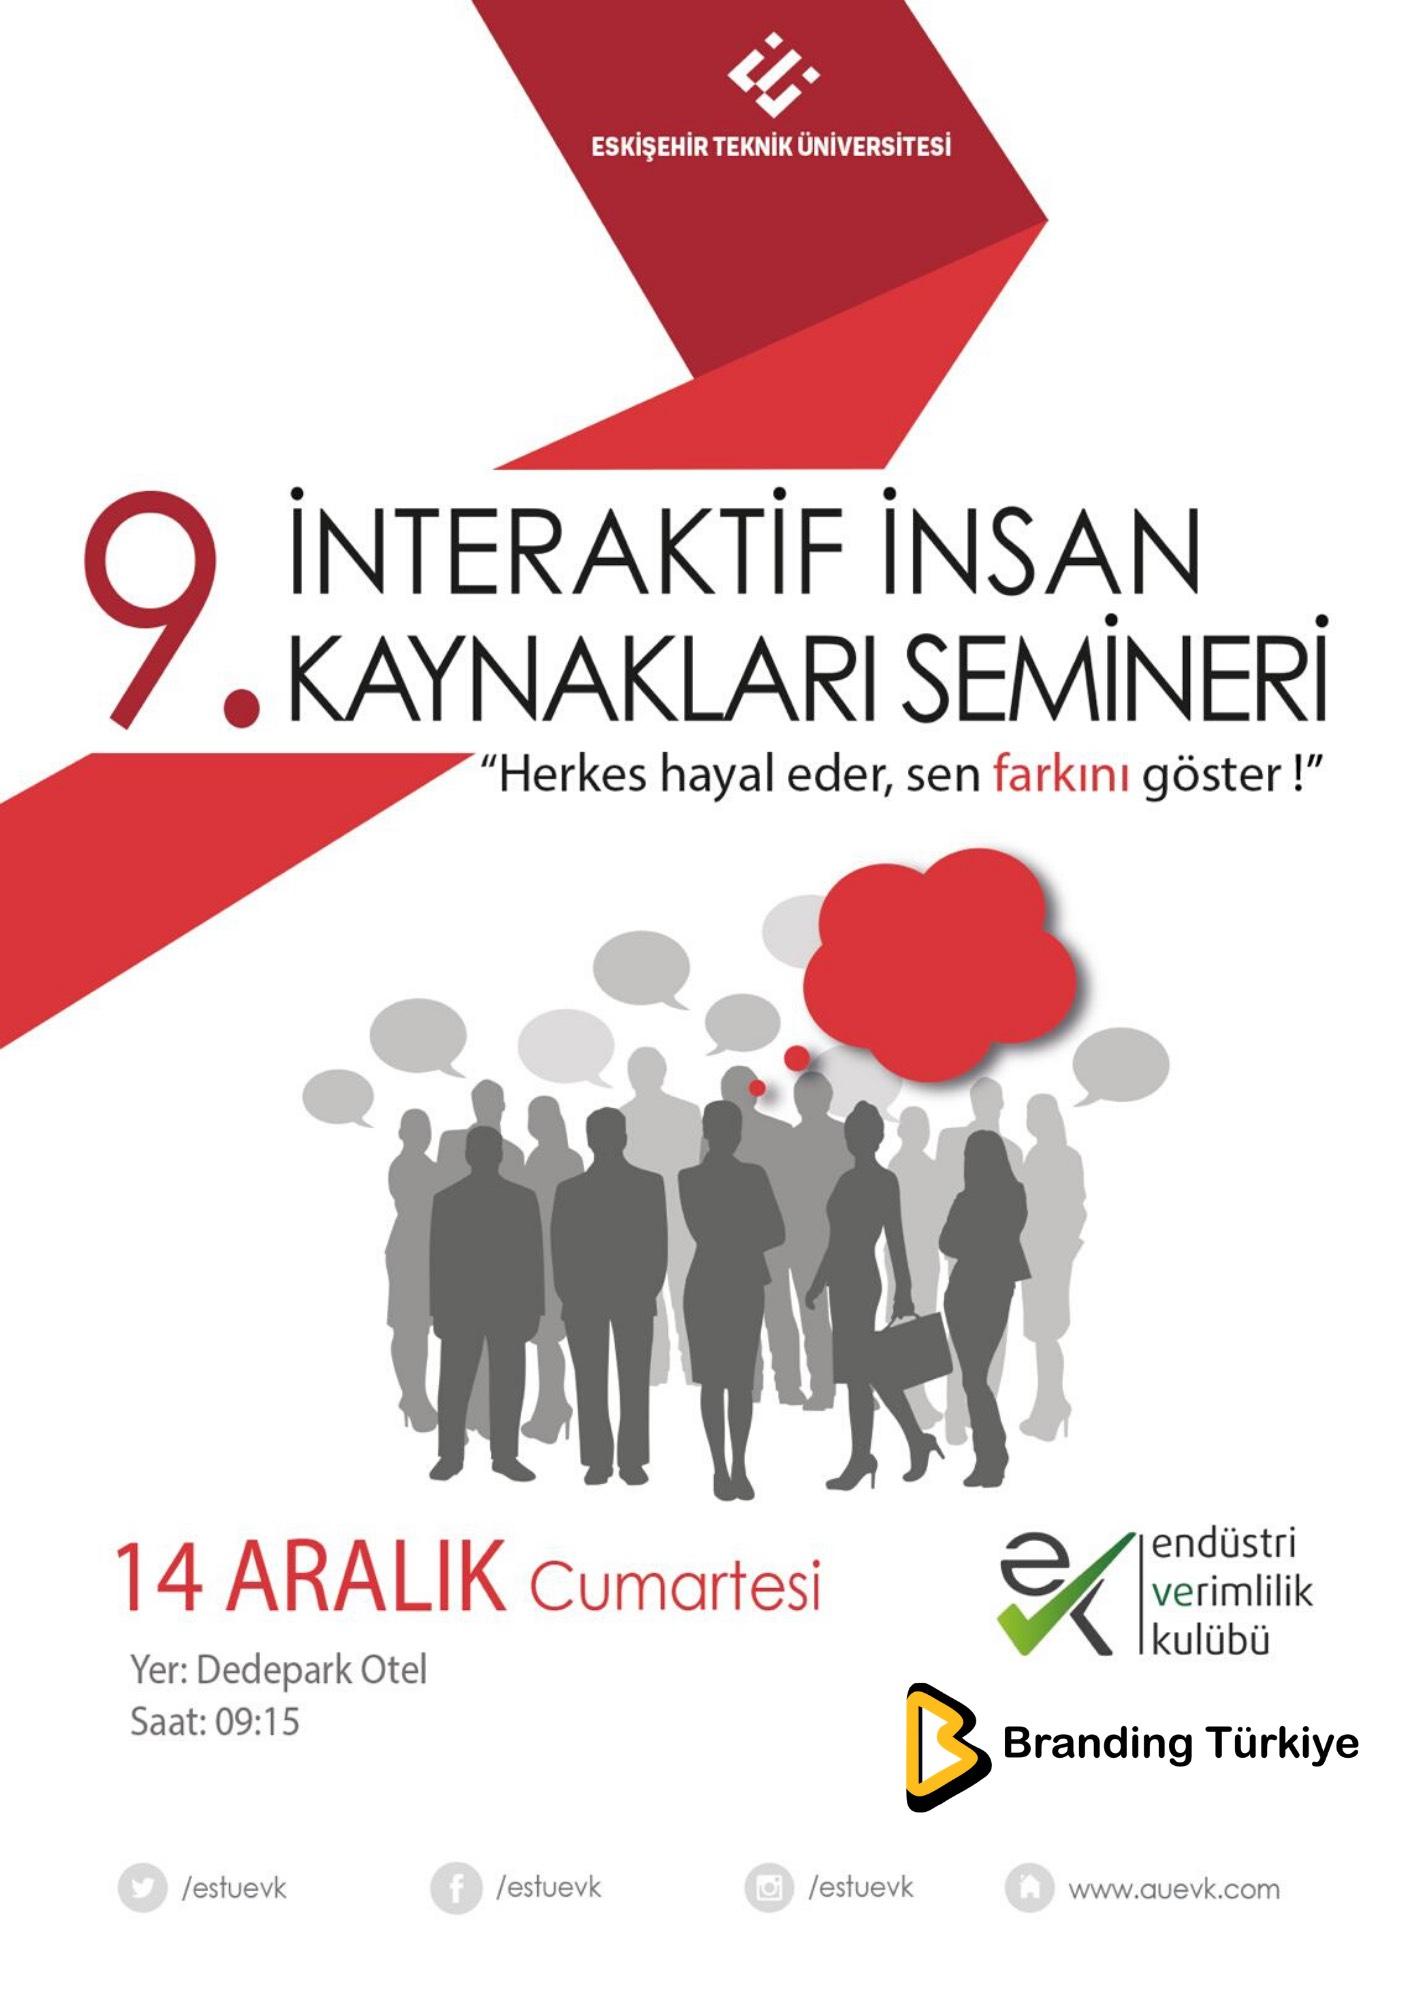 İnteraktif İnsan Kaynakları Semineri - Afiş